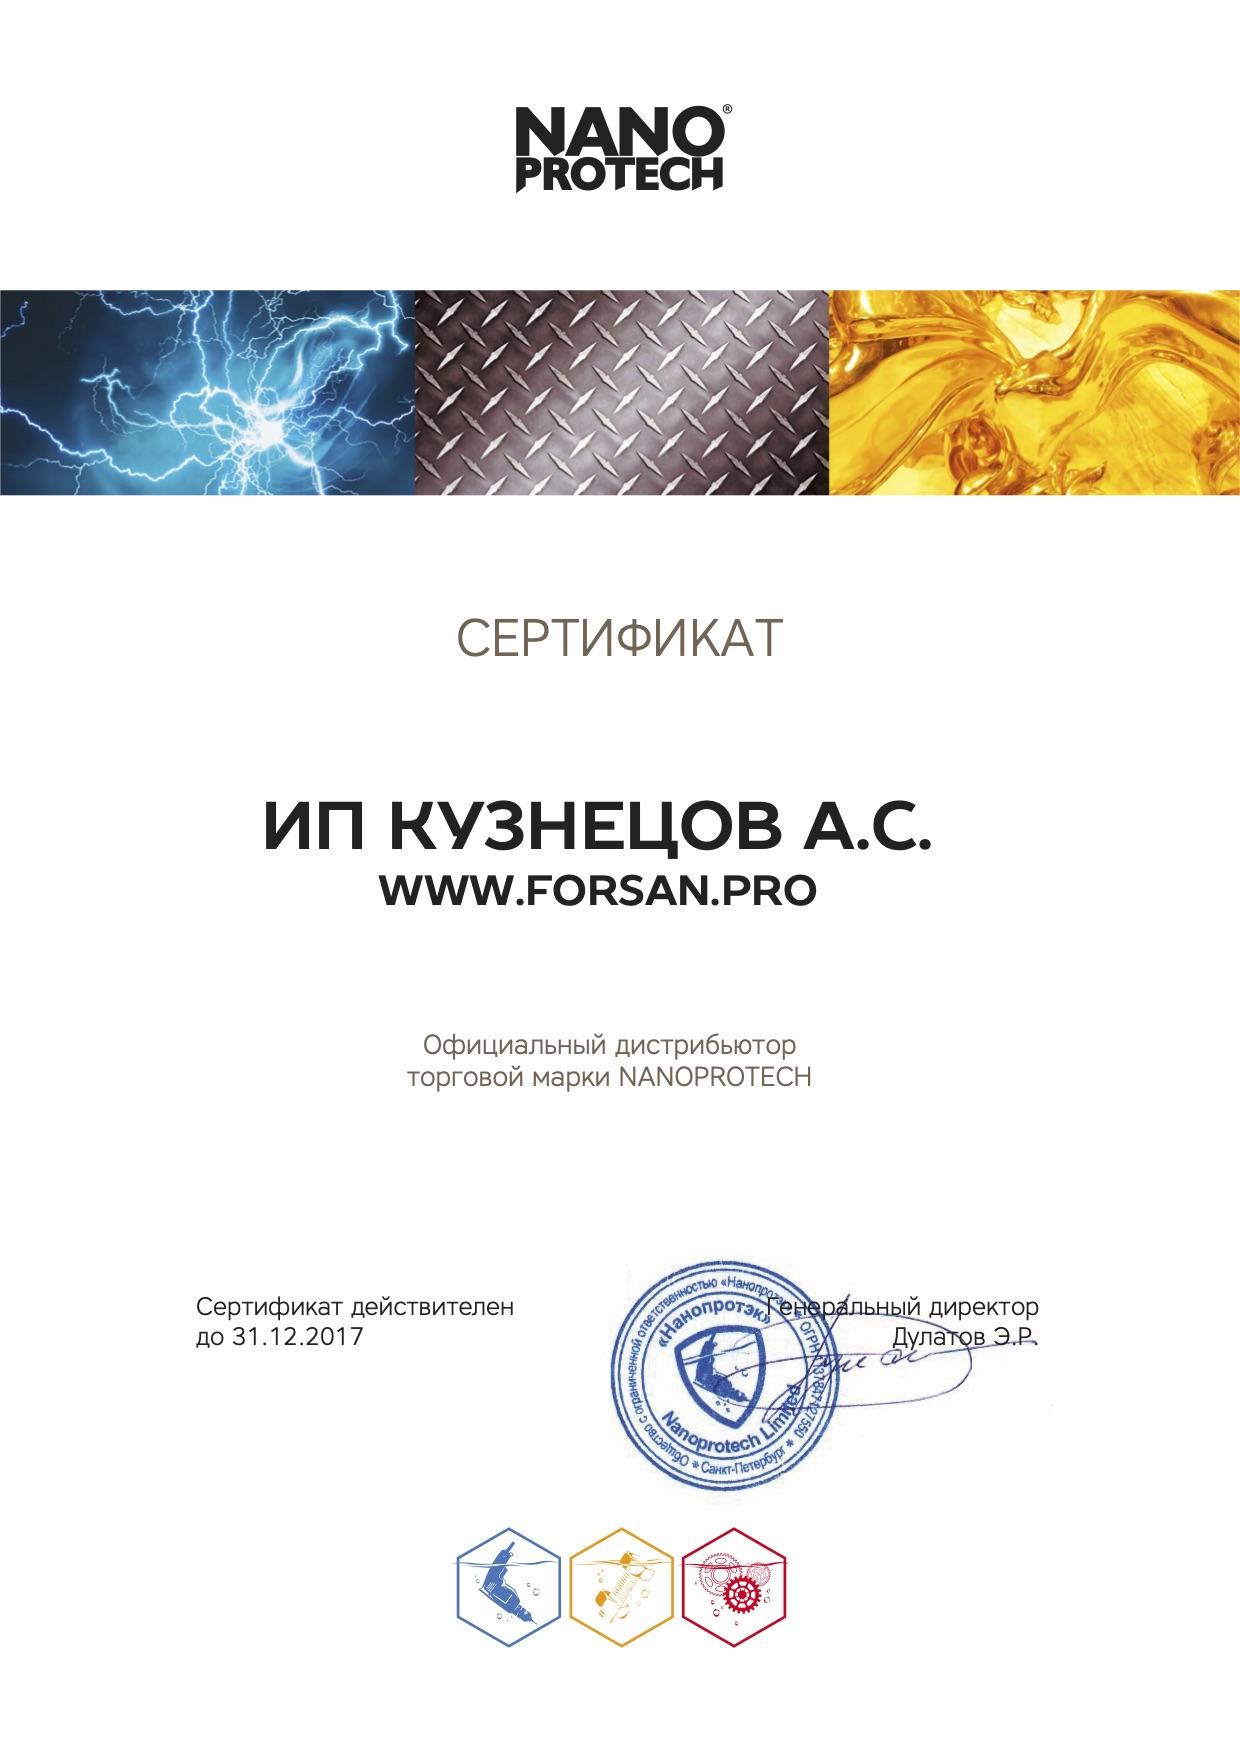 Сертификат дистрибьютора Nanoprotech